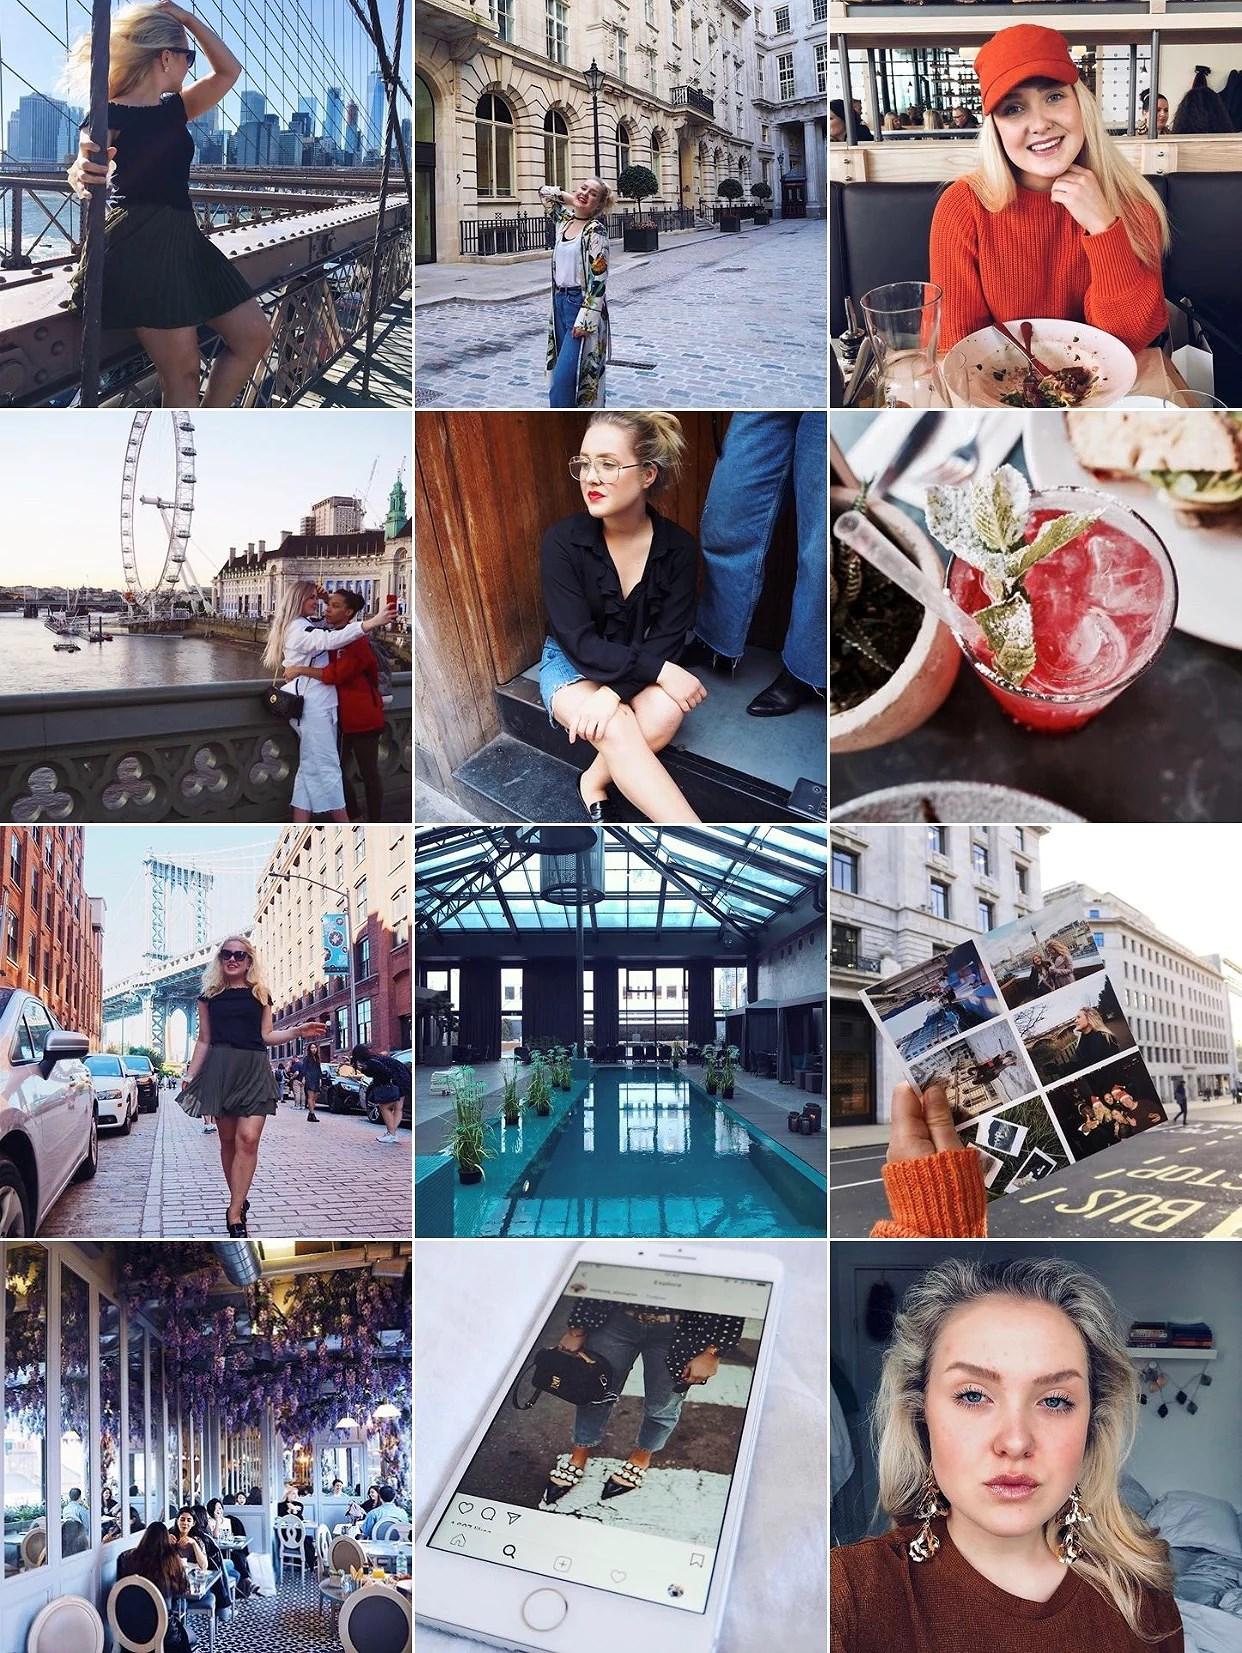 Hur går det på Instagram?